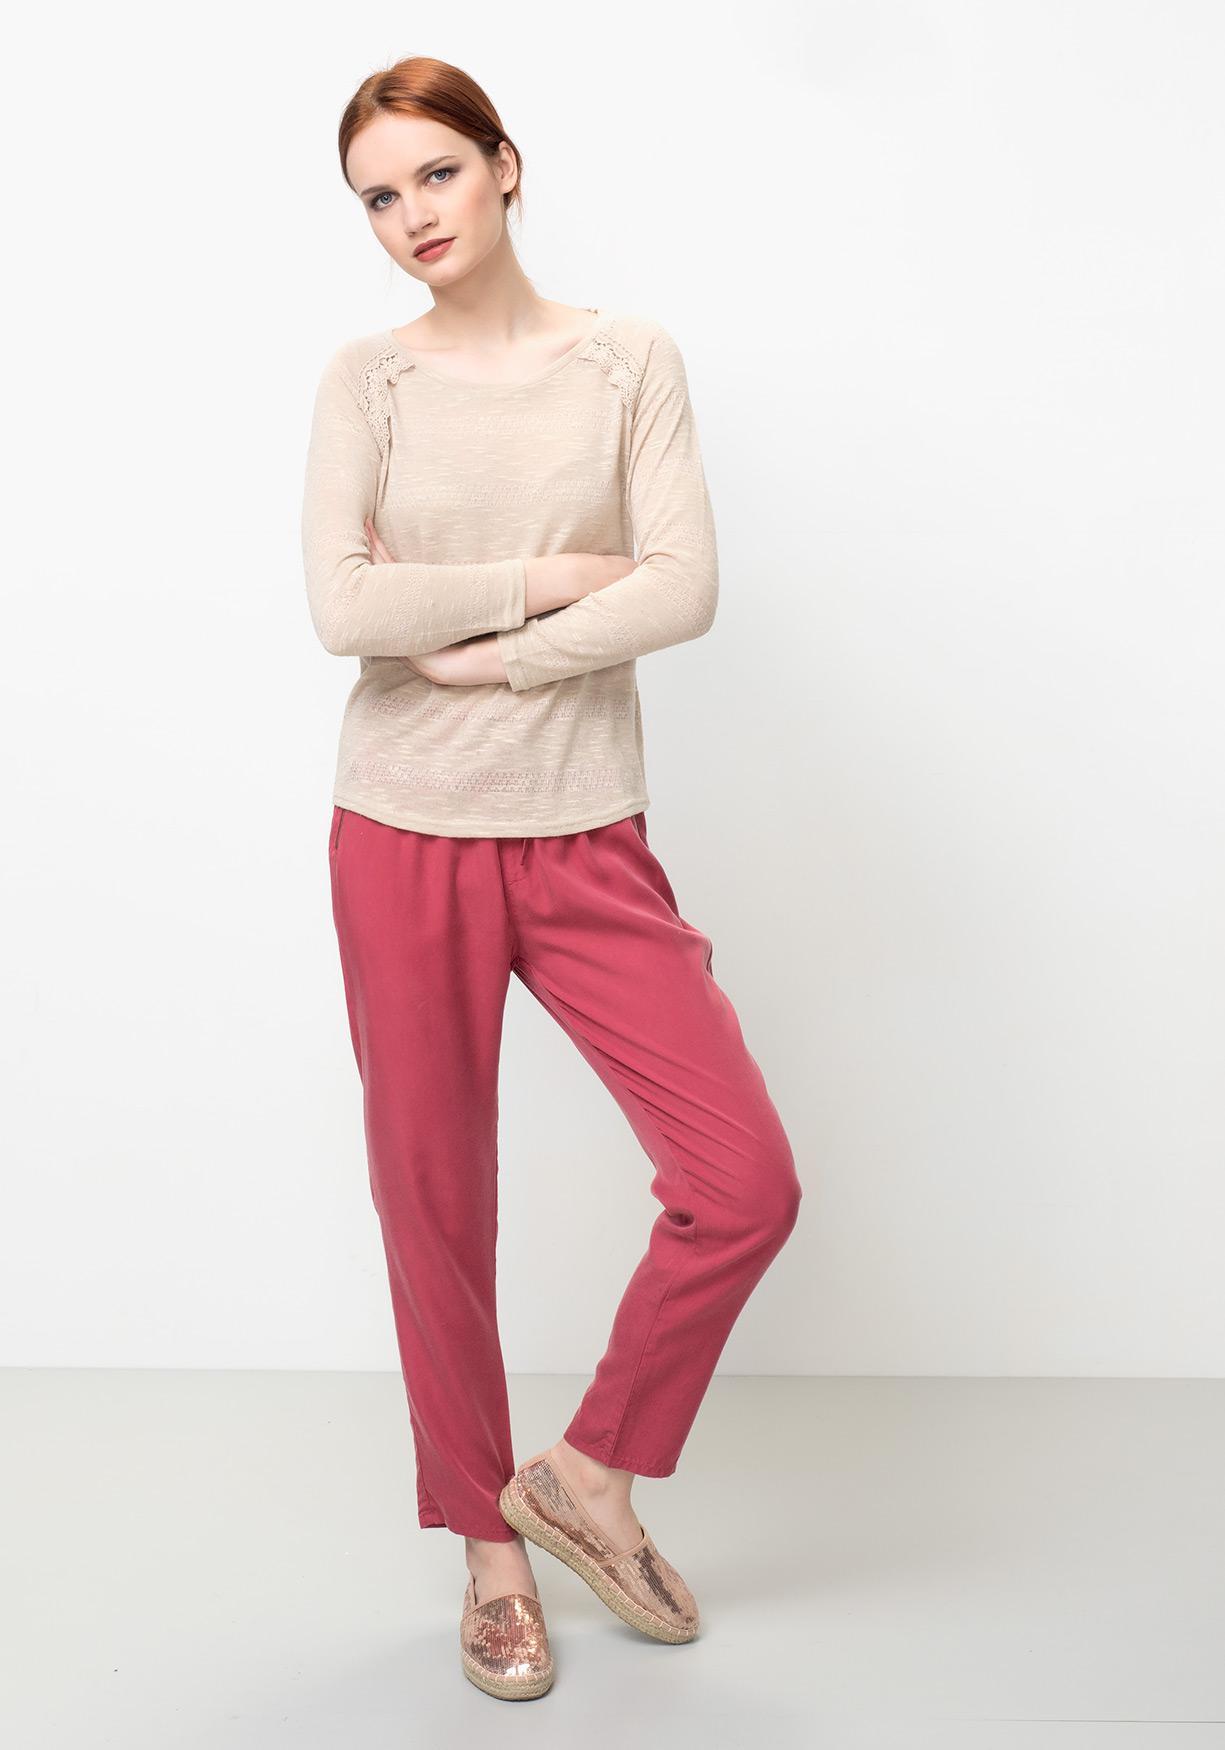 Comprar Jersey de mujer cuello redondo con manga larga TEX ... 4b5b07b0add4